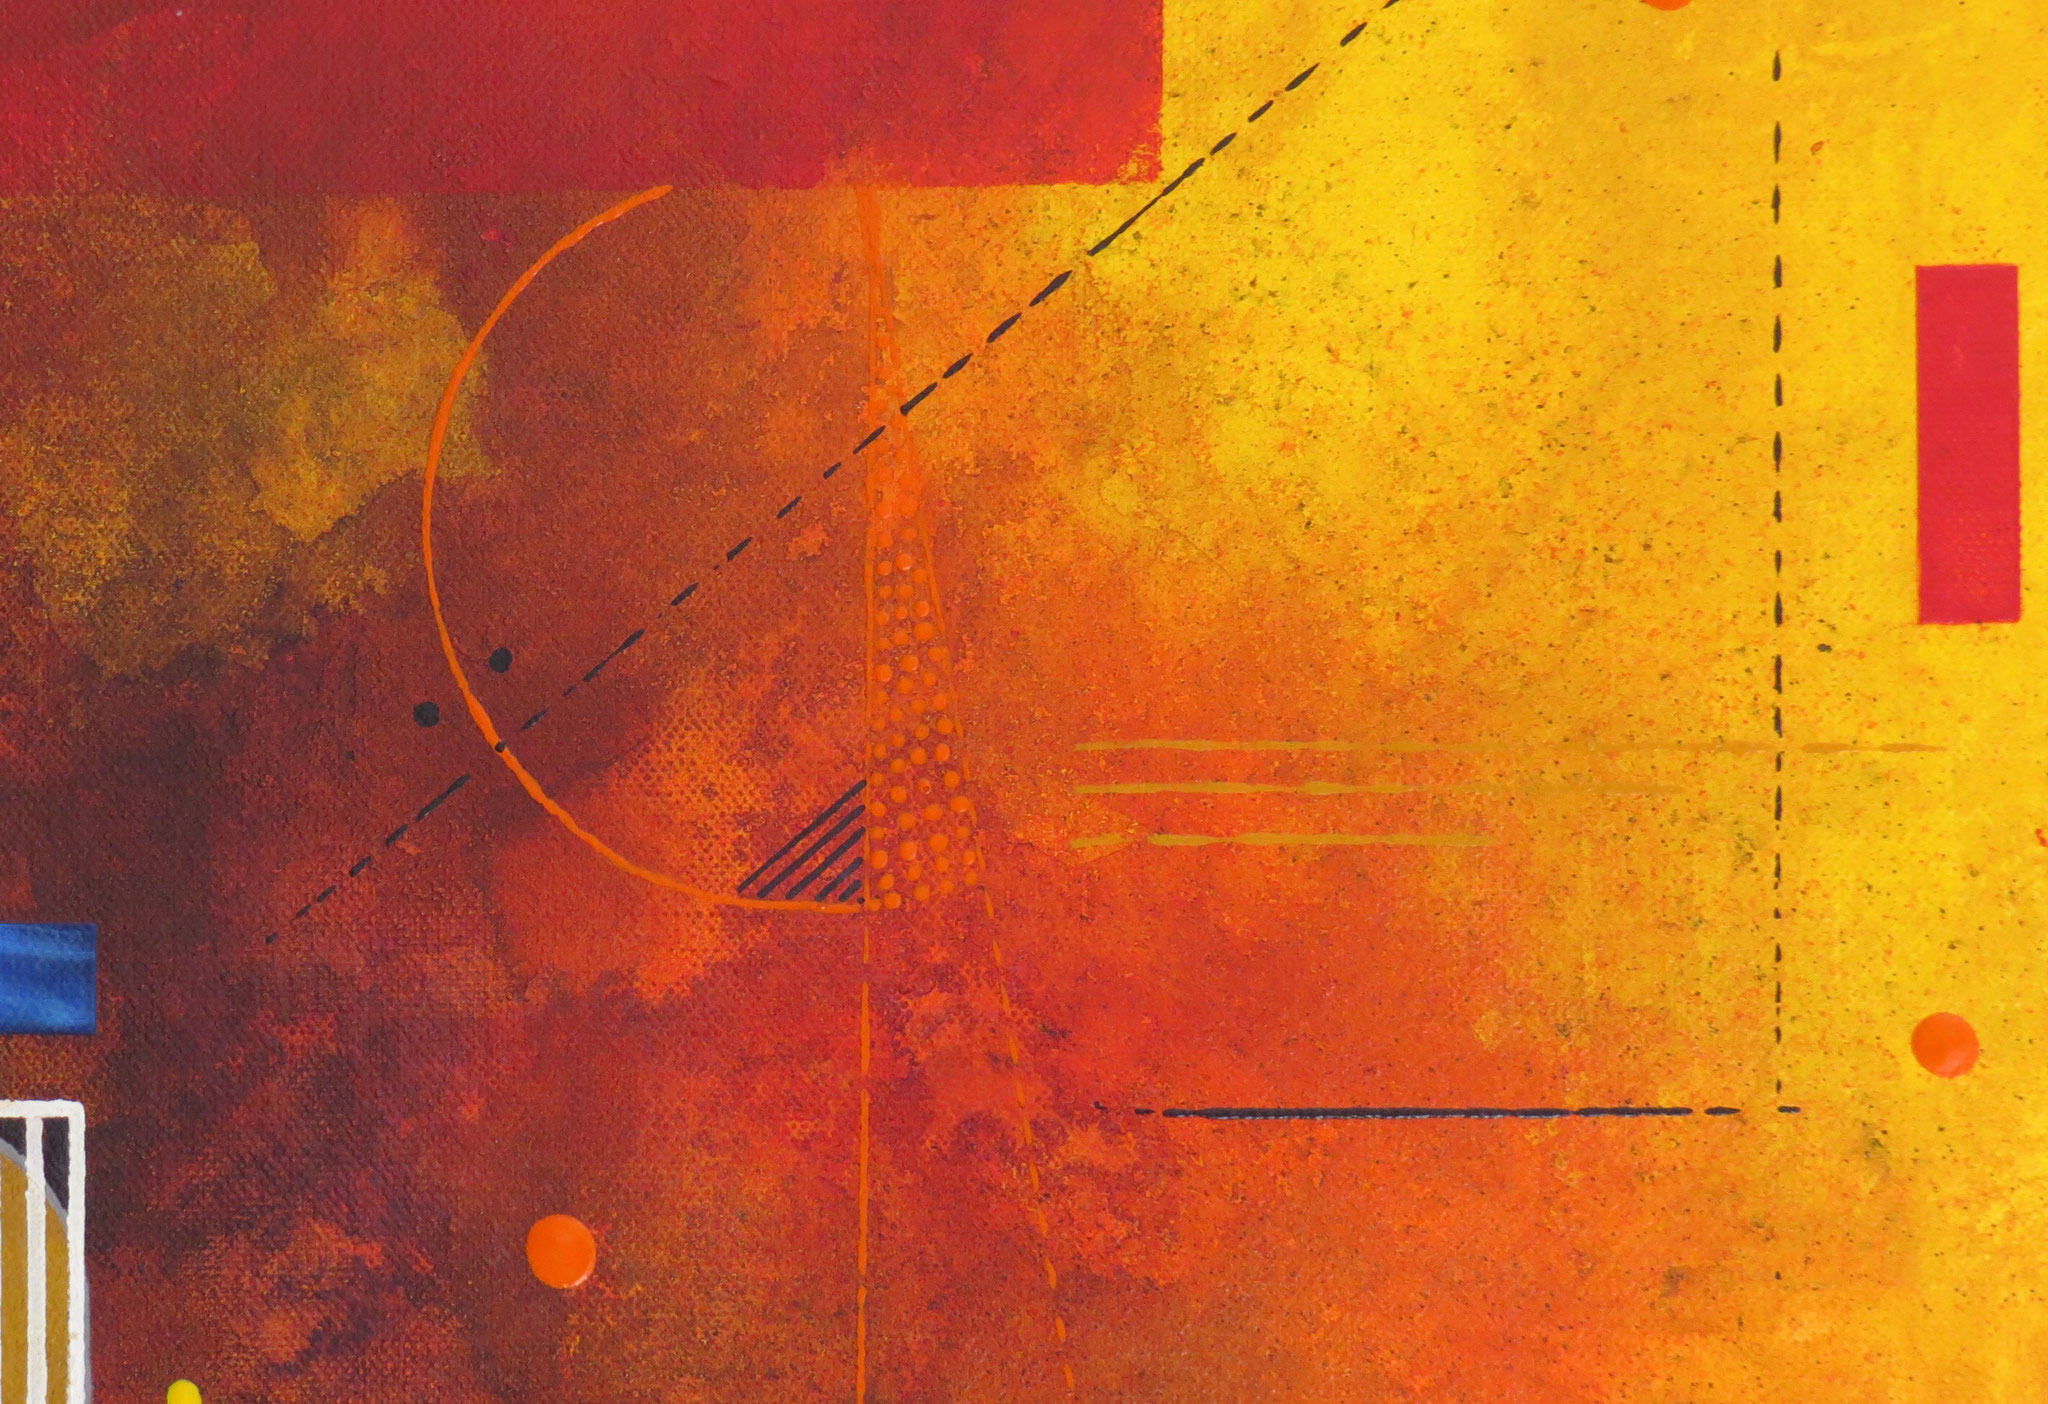 delta - zoom2 - DALUZ GALEGO - peinture abstraite